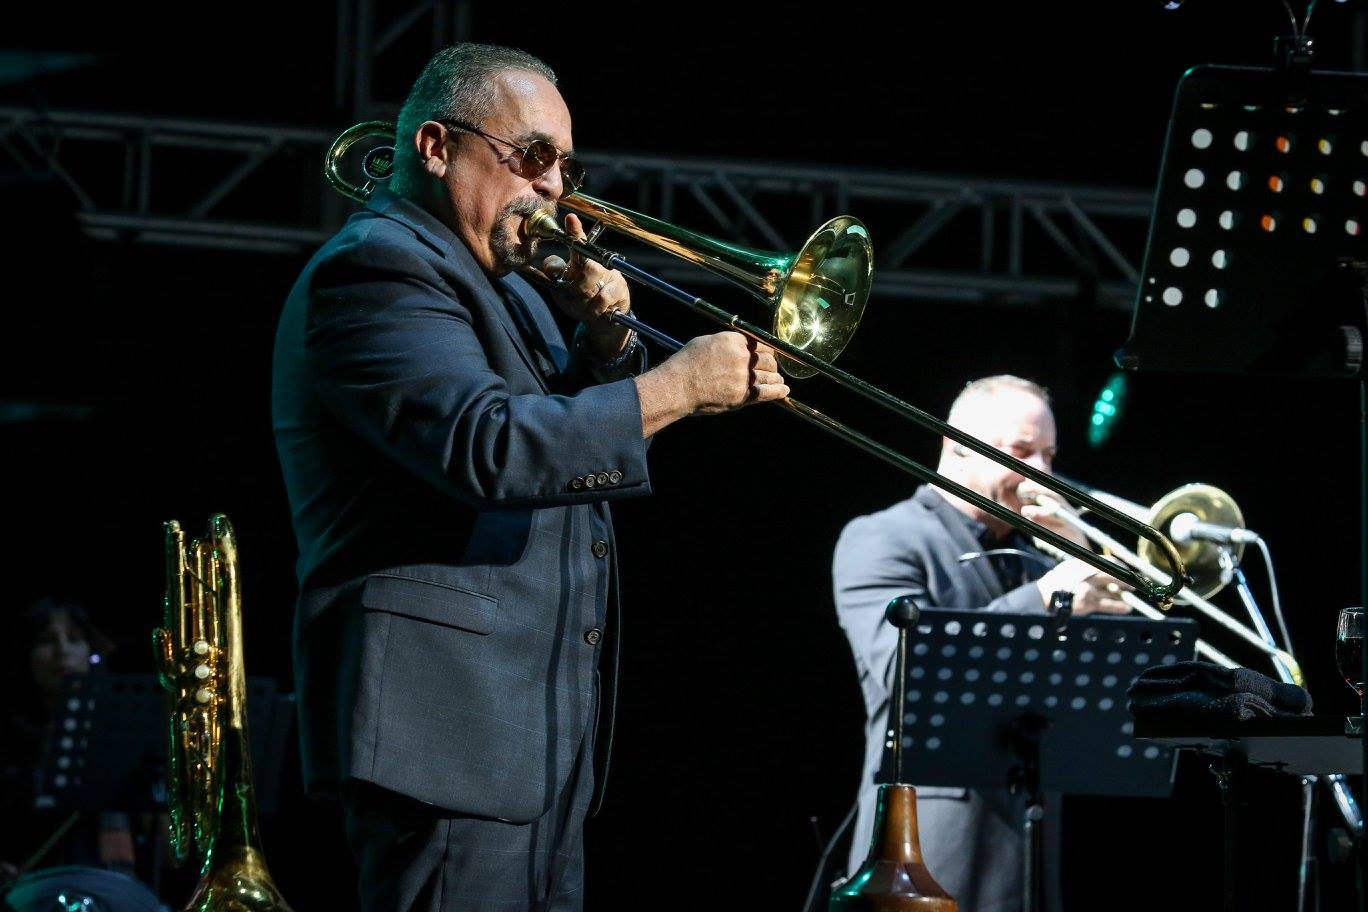 Willie Colón @Choli